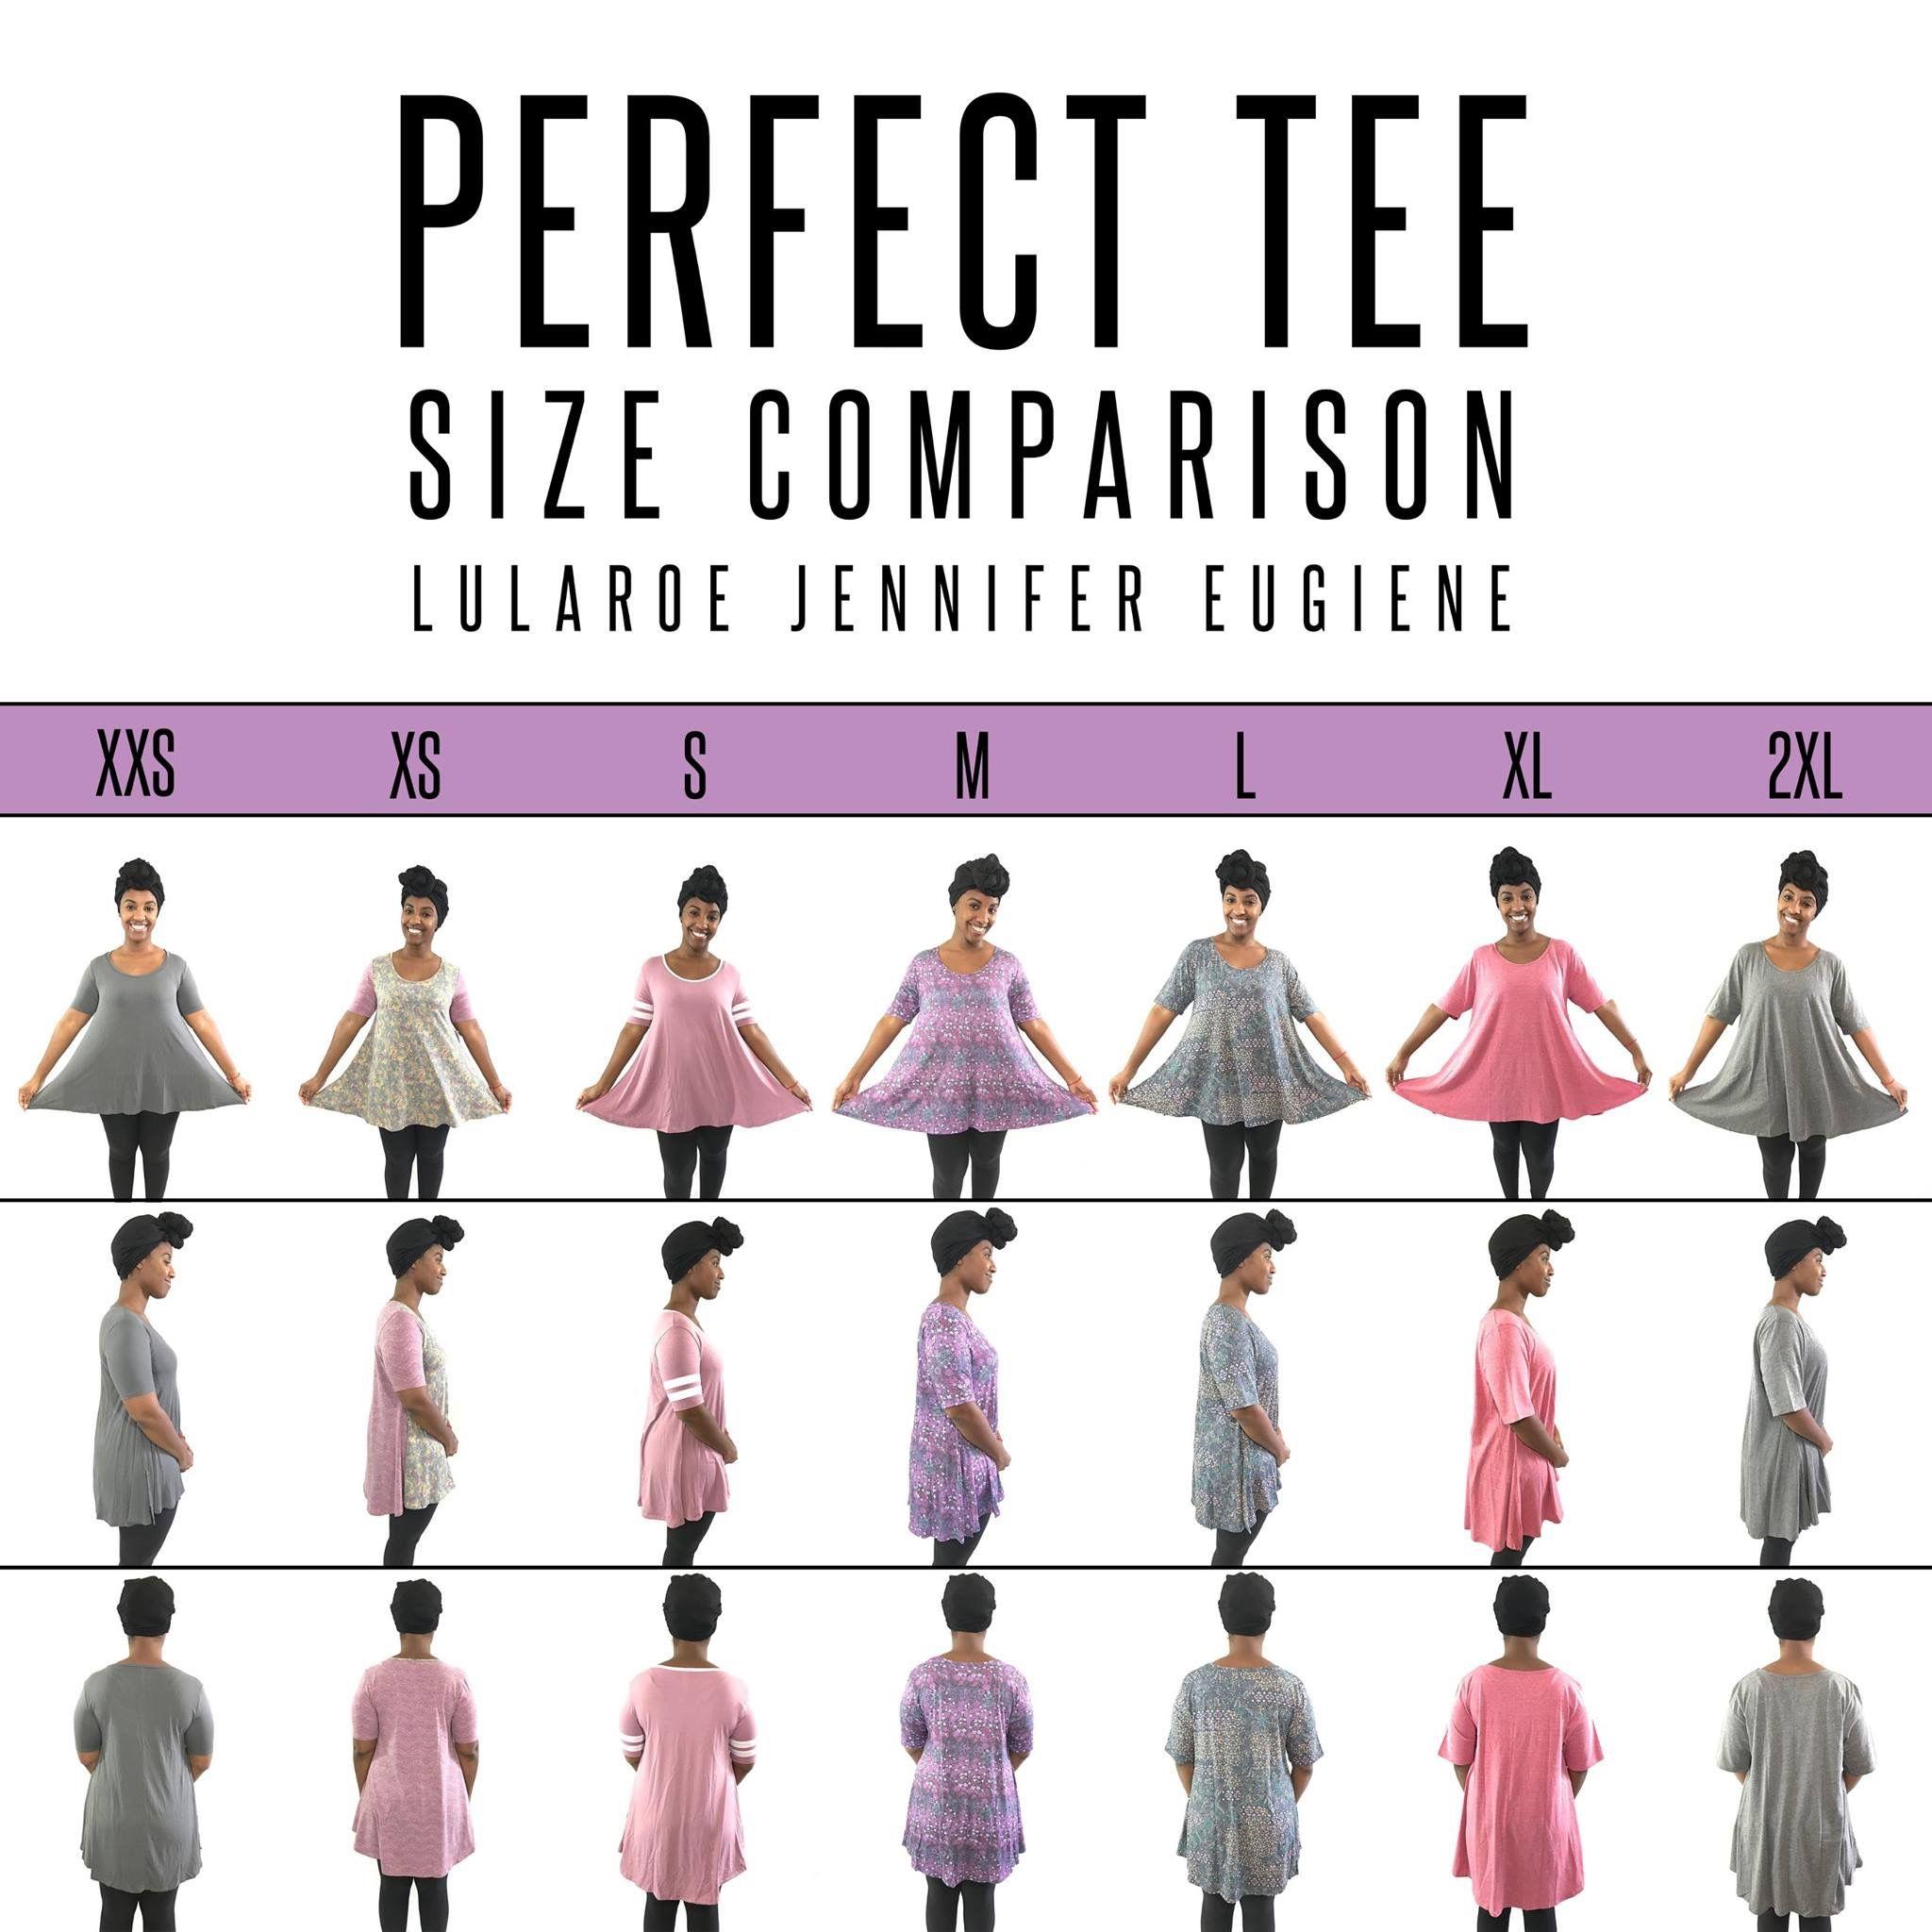 9d61c09c937 LuLaRoe Perfect Tee size comparison XXS-2XL. I m 5 3 and wear a XS Perfect!   lularoejennifereugiene  LuLaRoePerfectTee